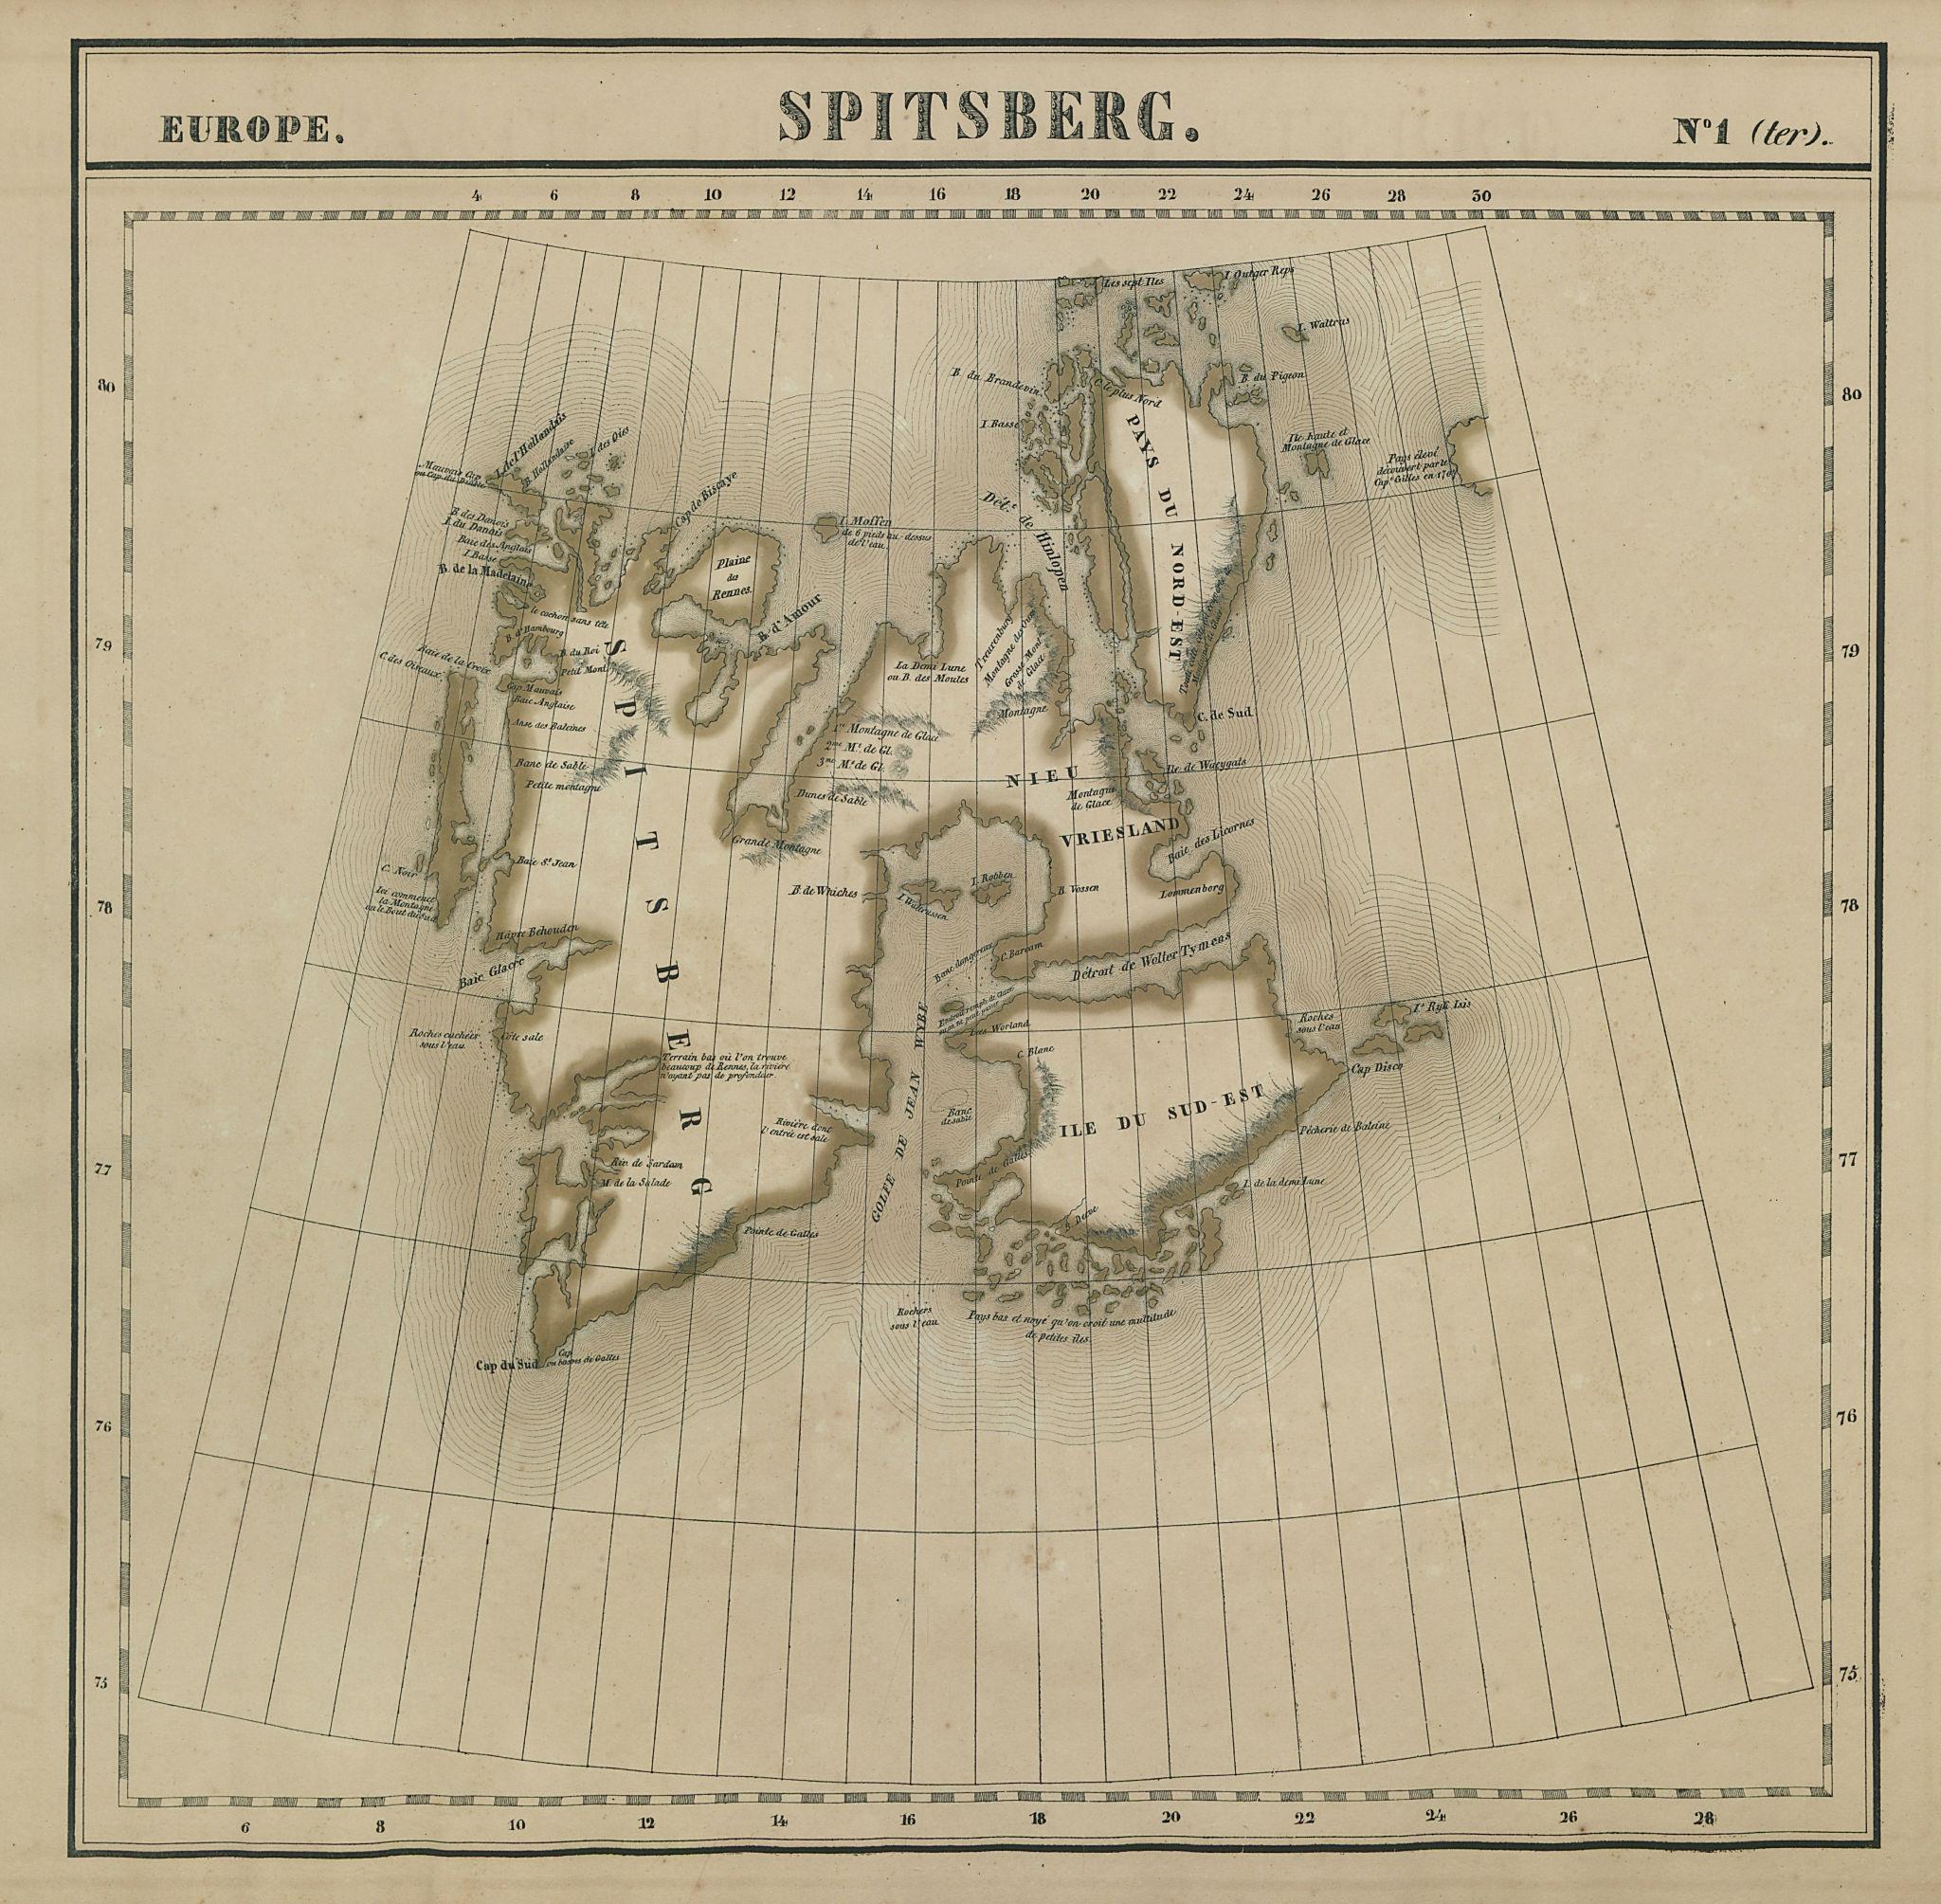 Europe. Spitsberg #1 (ter) Spitsbergen Svalbard Norway. VANDERMAELEN 1827 map